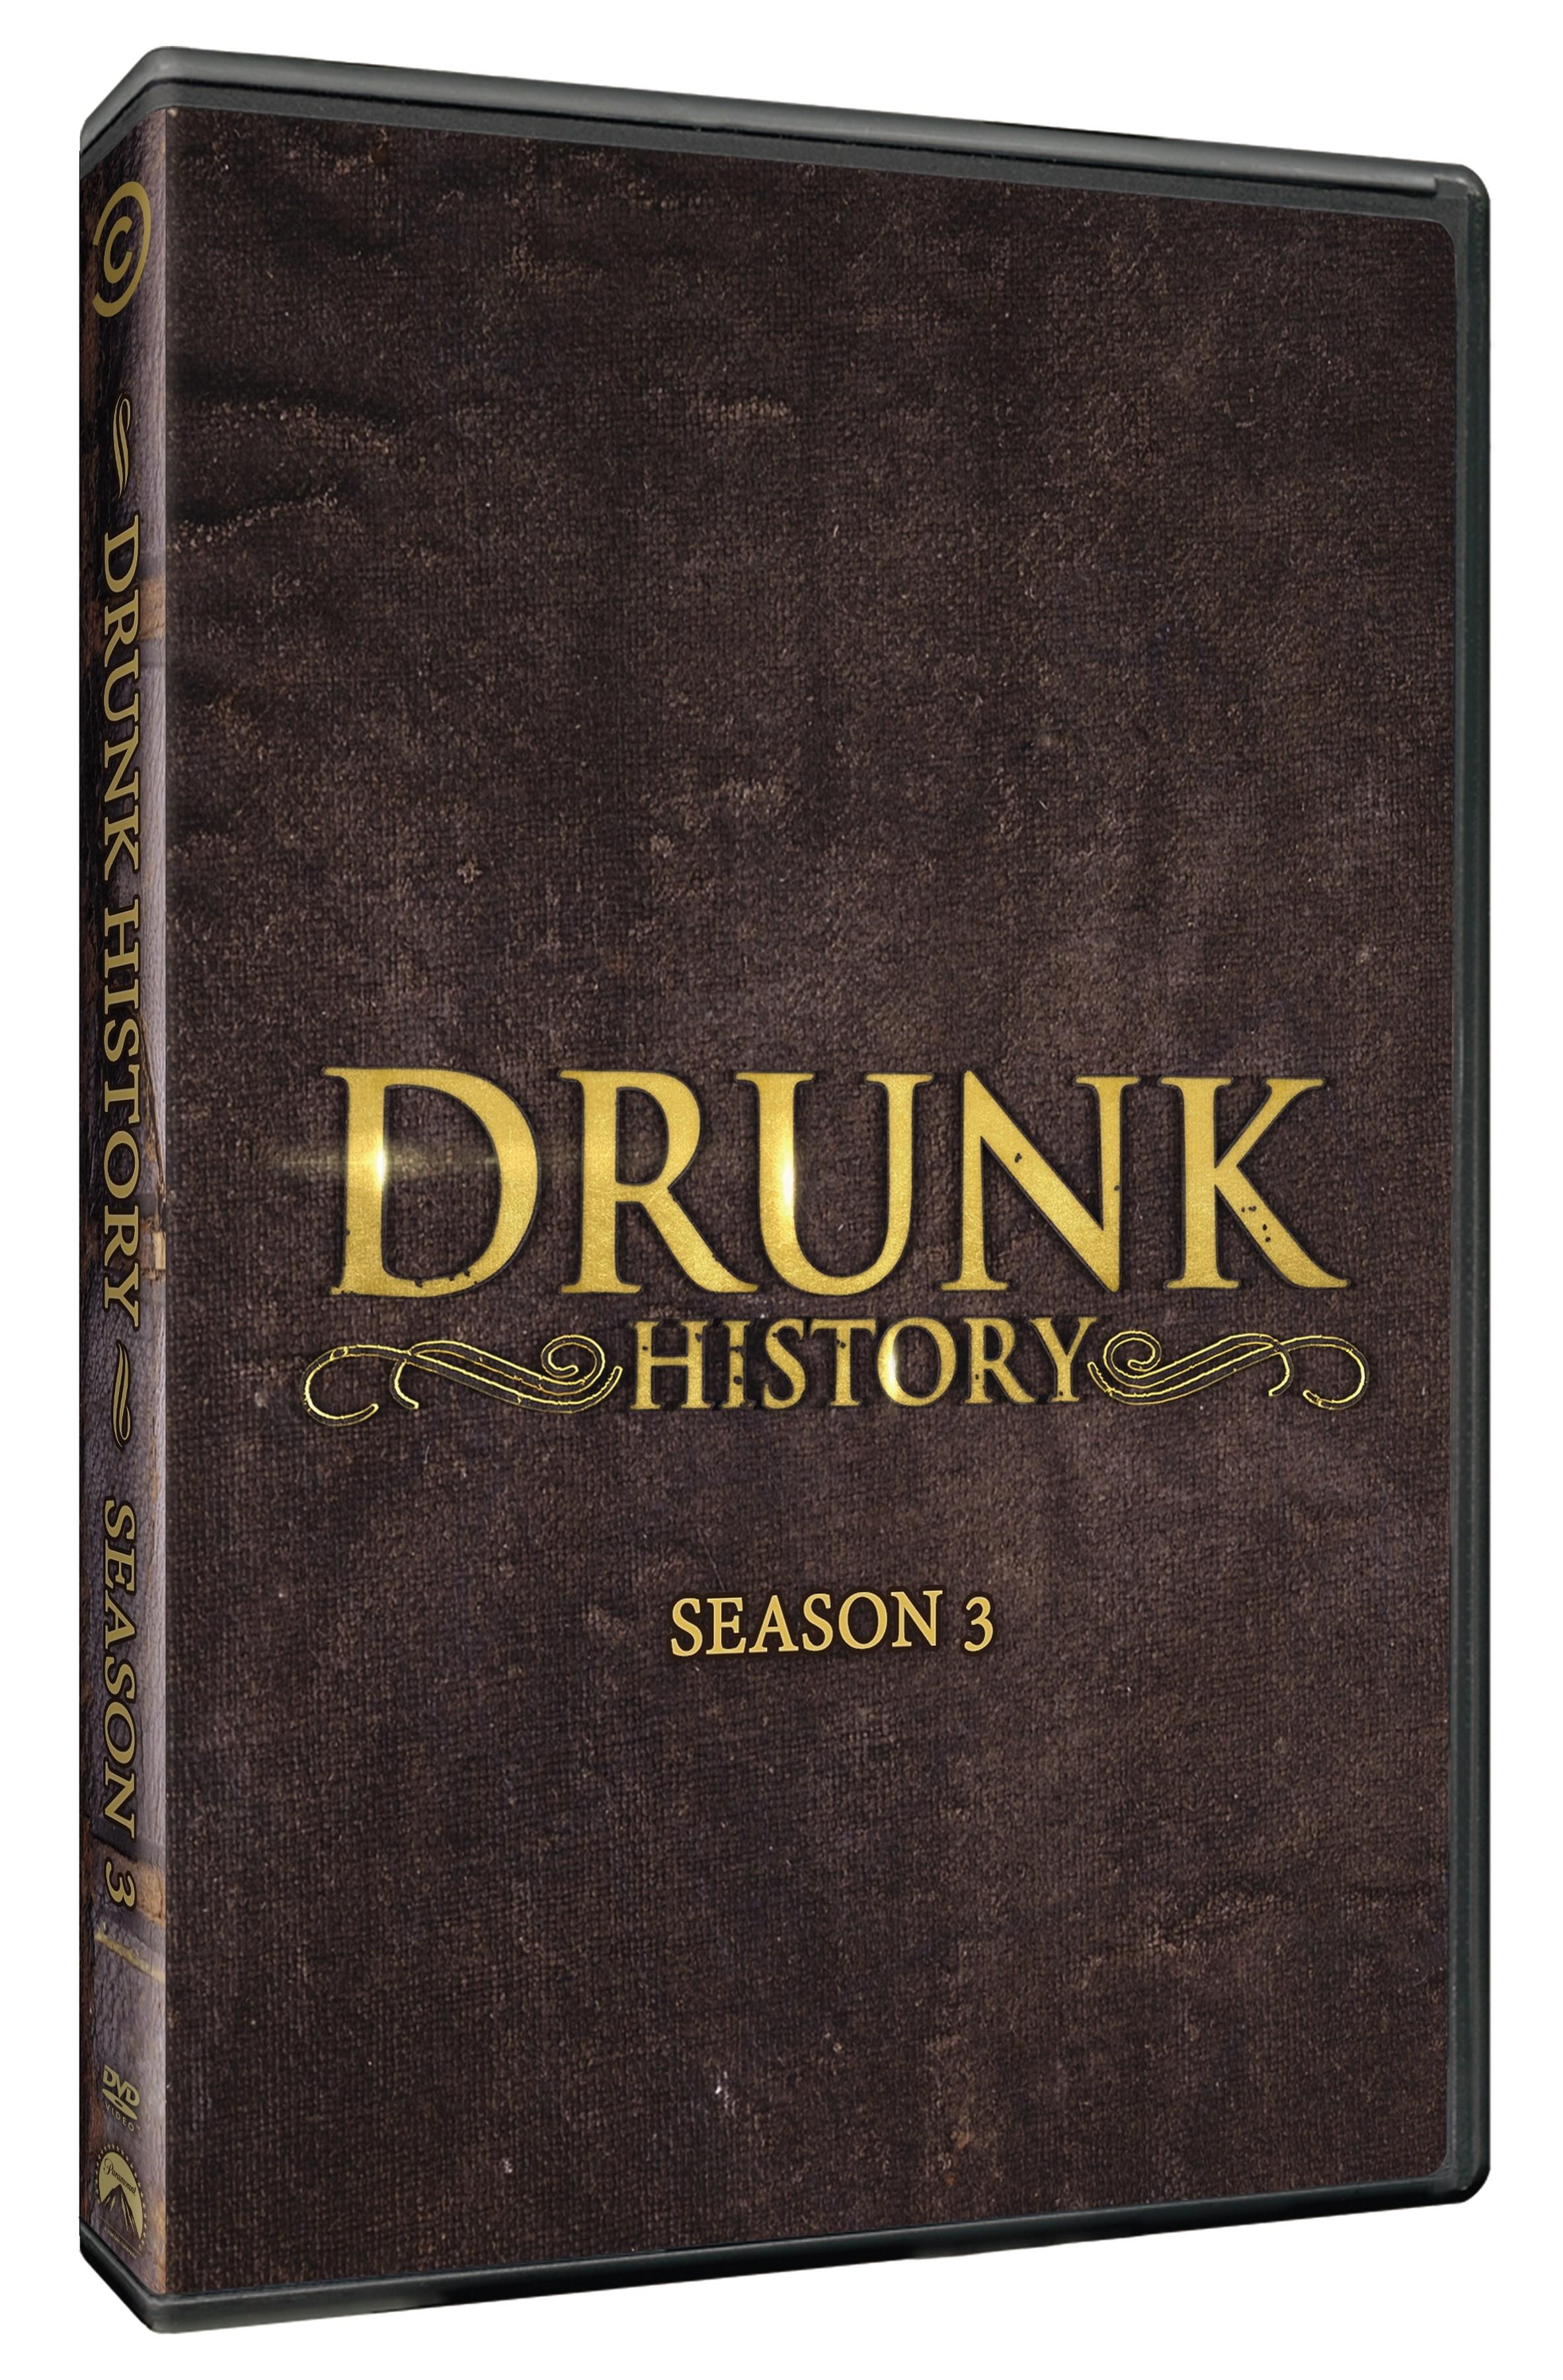 Drunk History Season 3 DVD Review